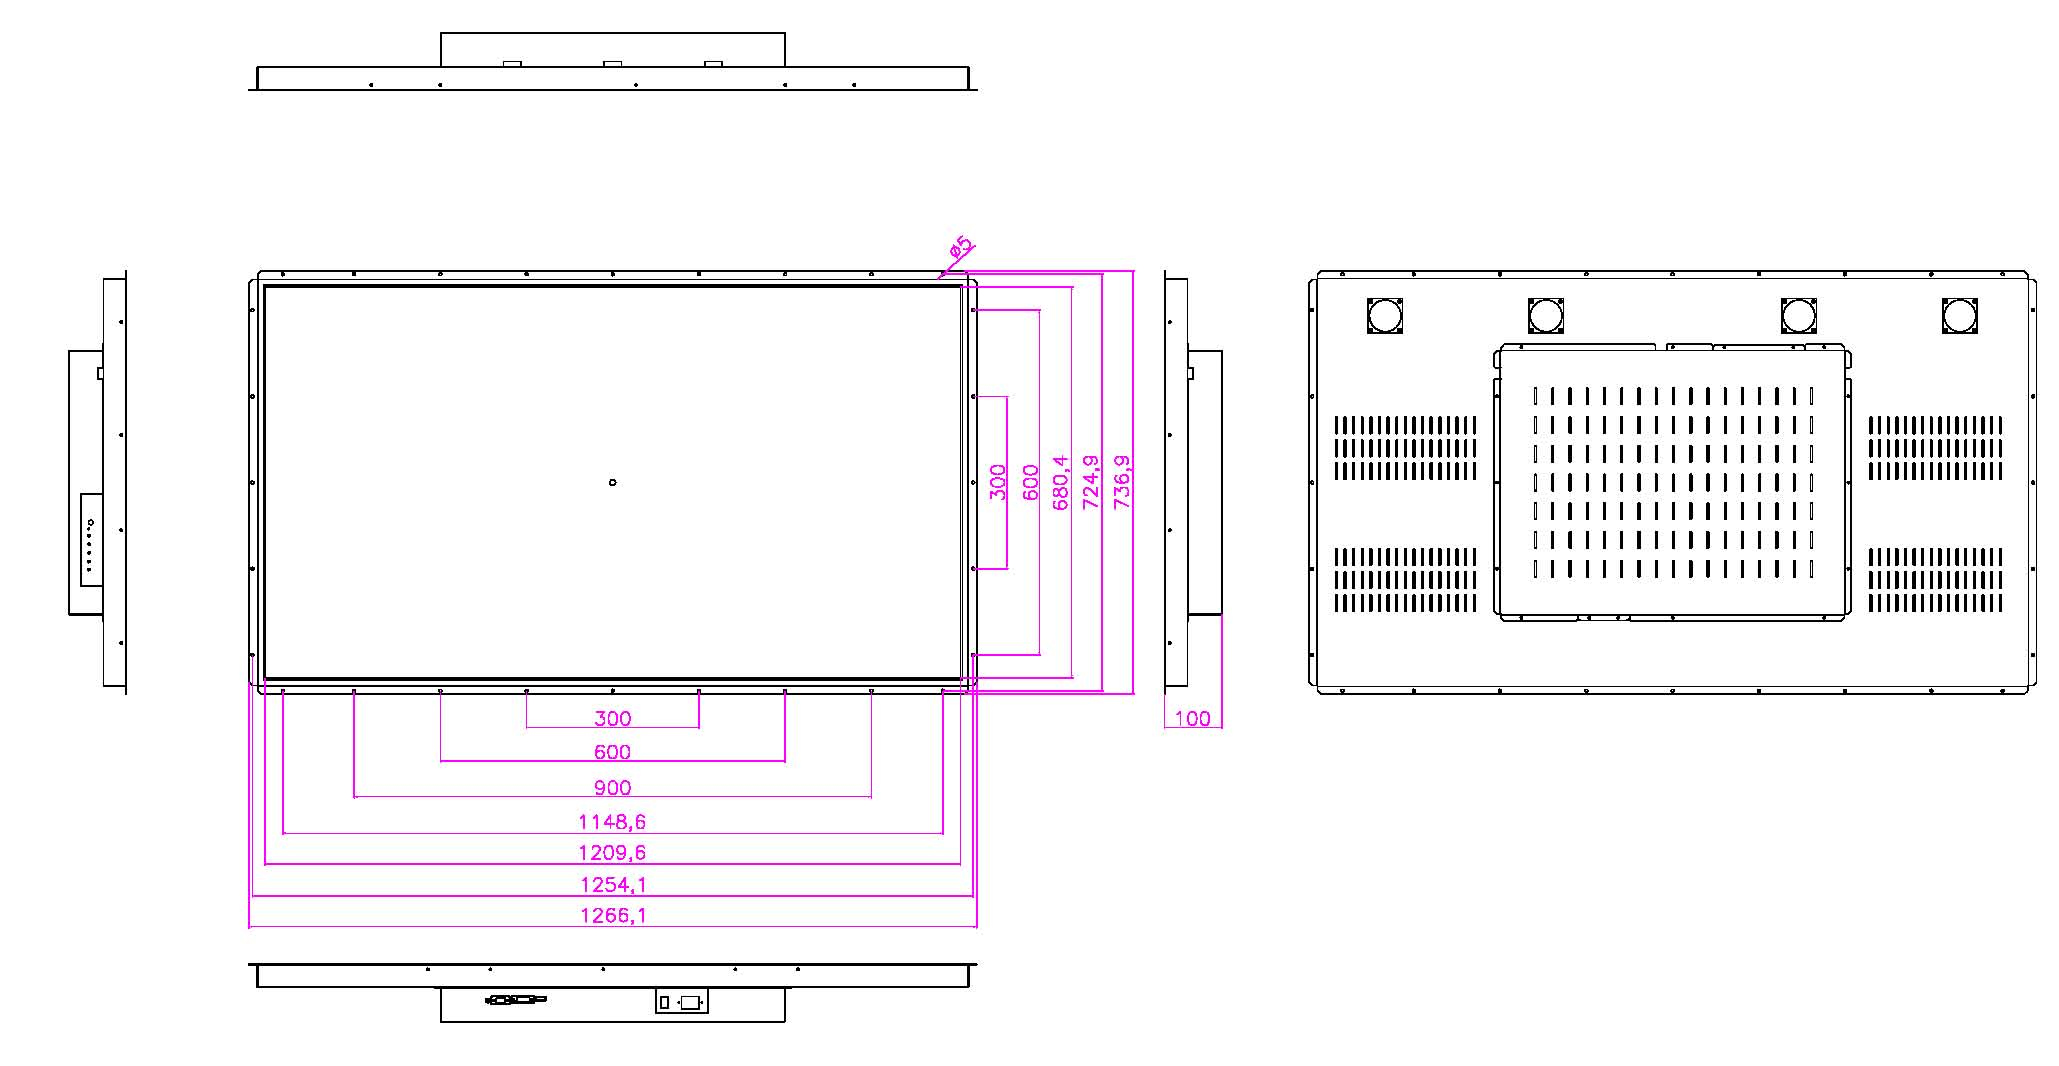 VH-W5512LO_10 液晶モニター高輝度半透過型(オープンフレーム)組み込み用19インチ